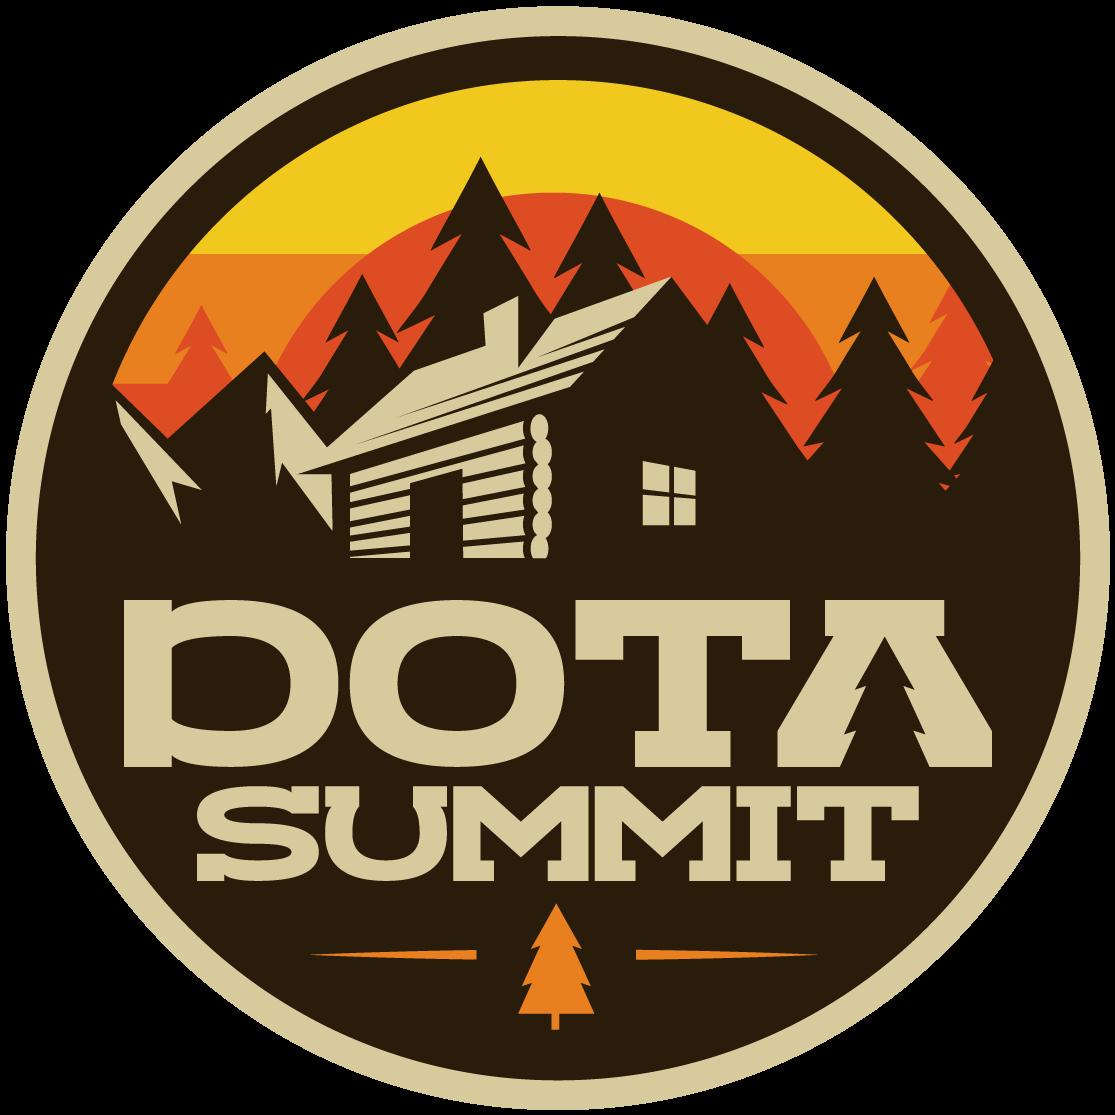 The Summit Dota 2 Series